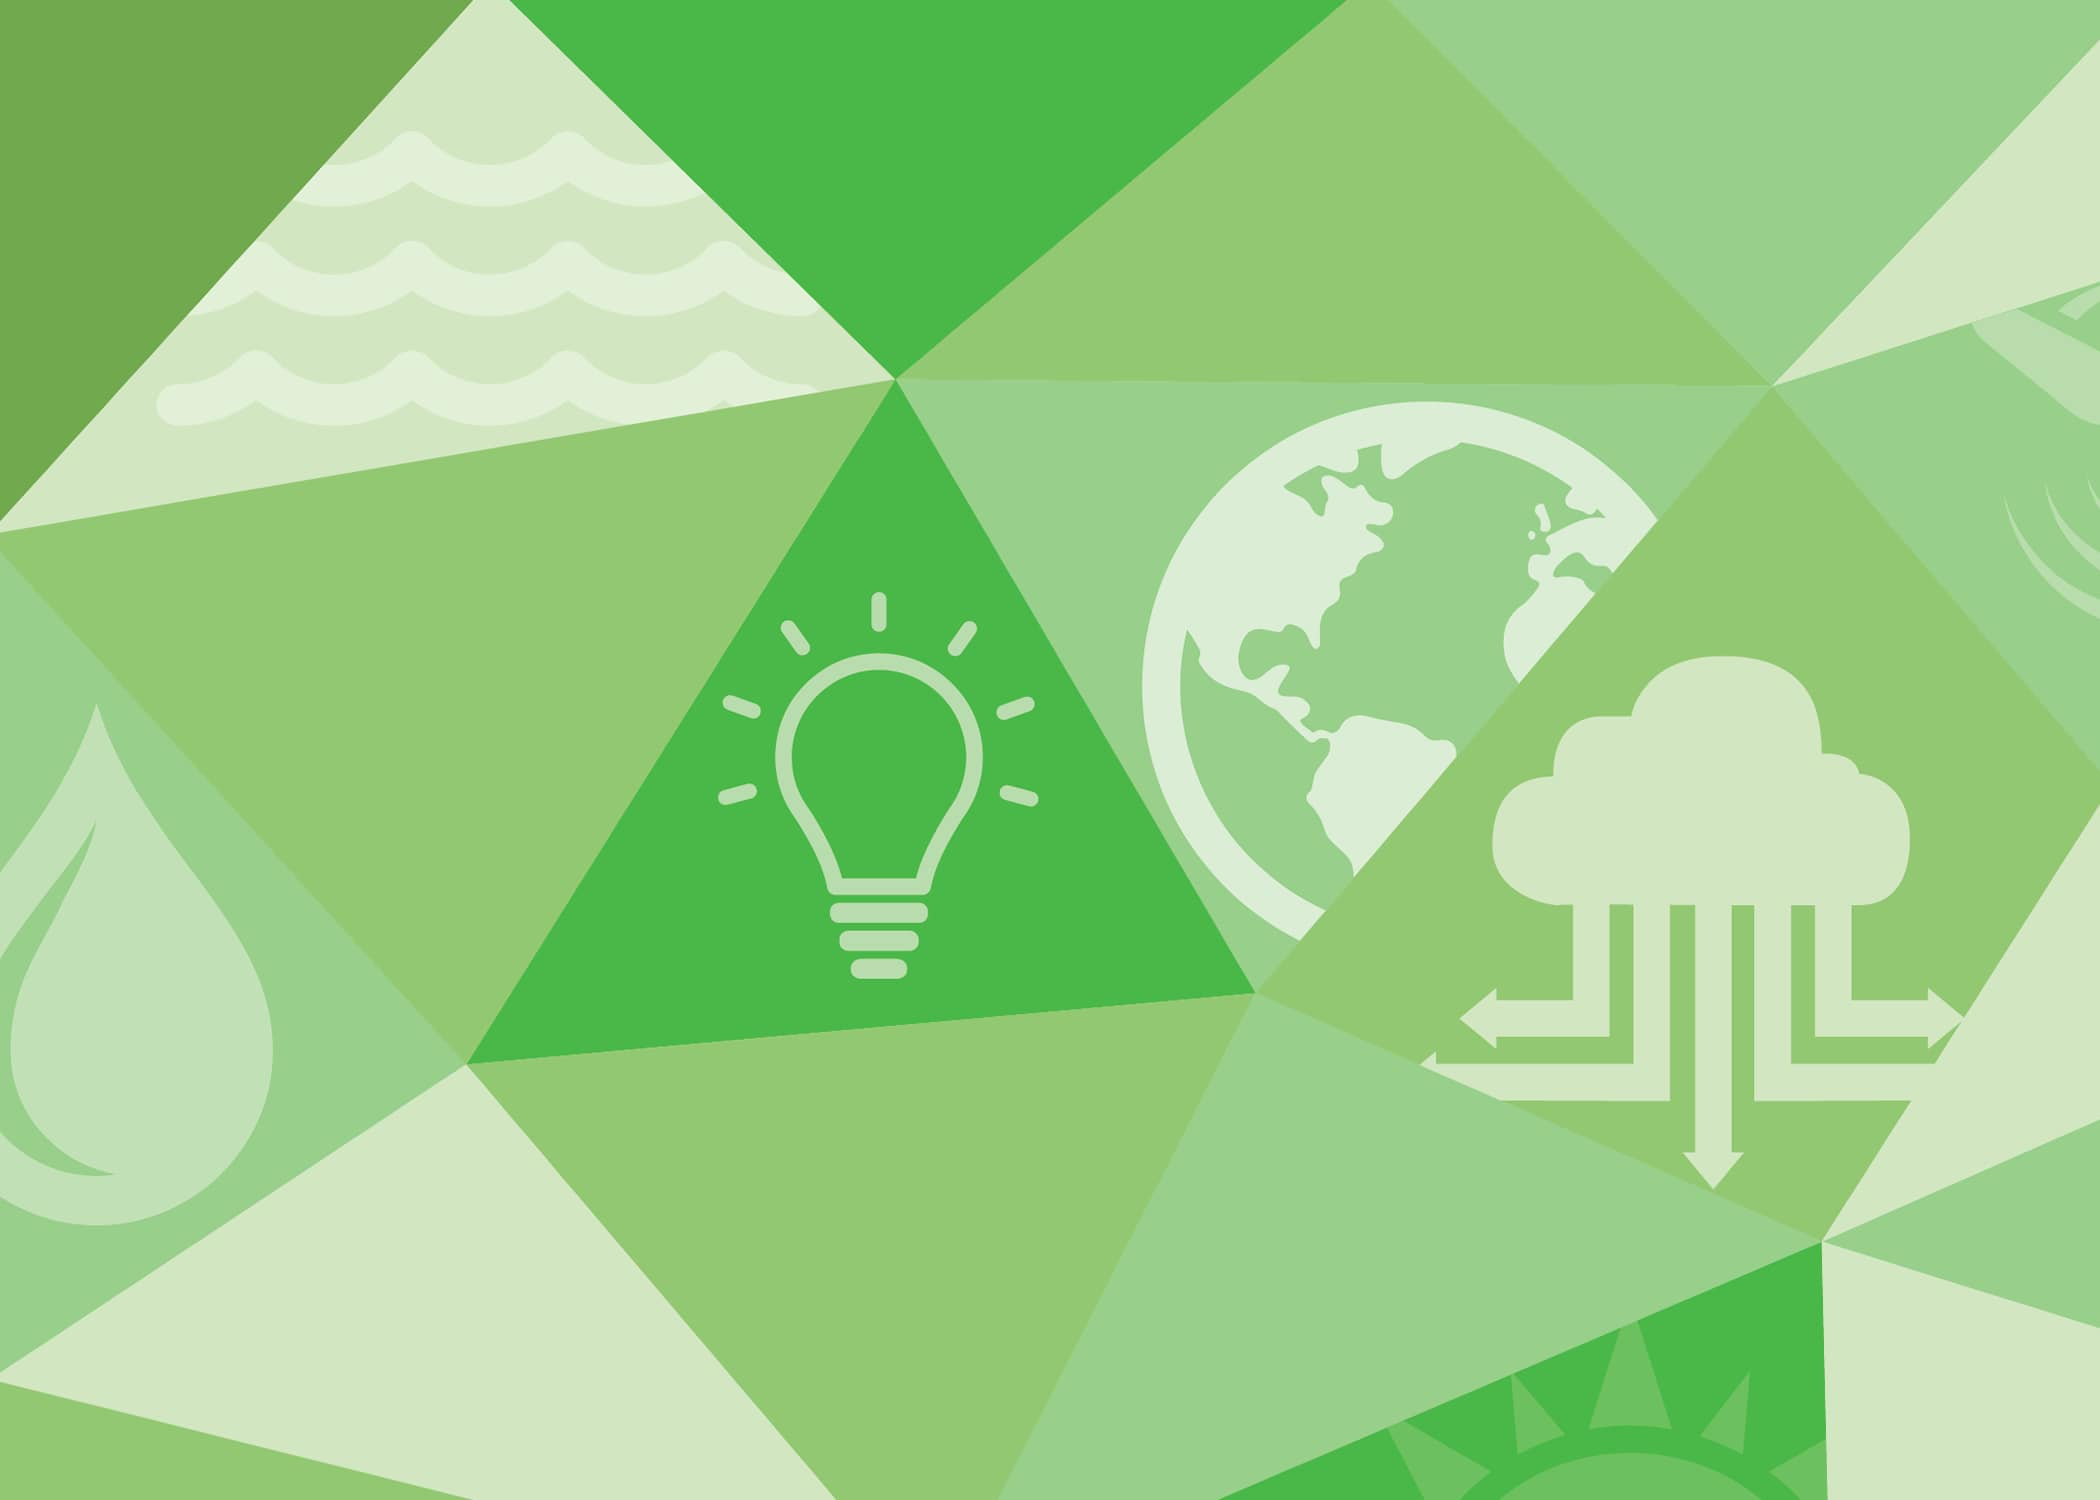 naem-webinar-2017-sustainability-management-conference-livestream-2100x1500